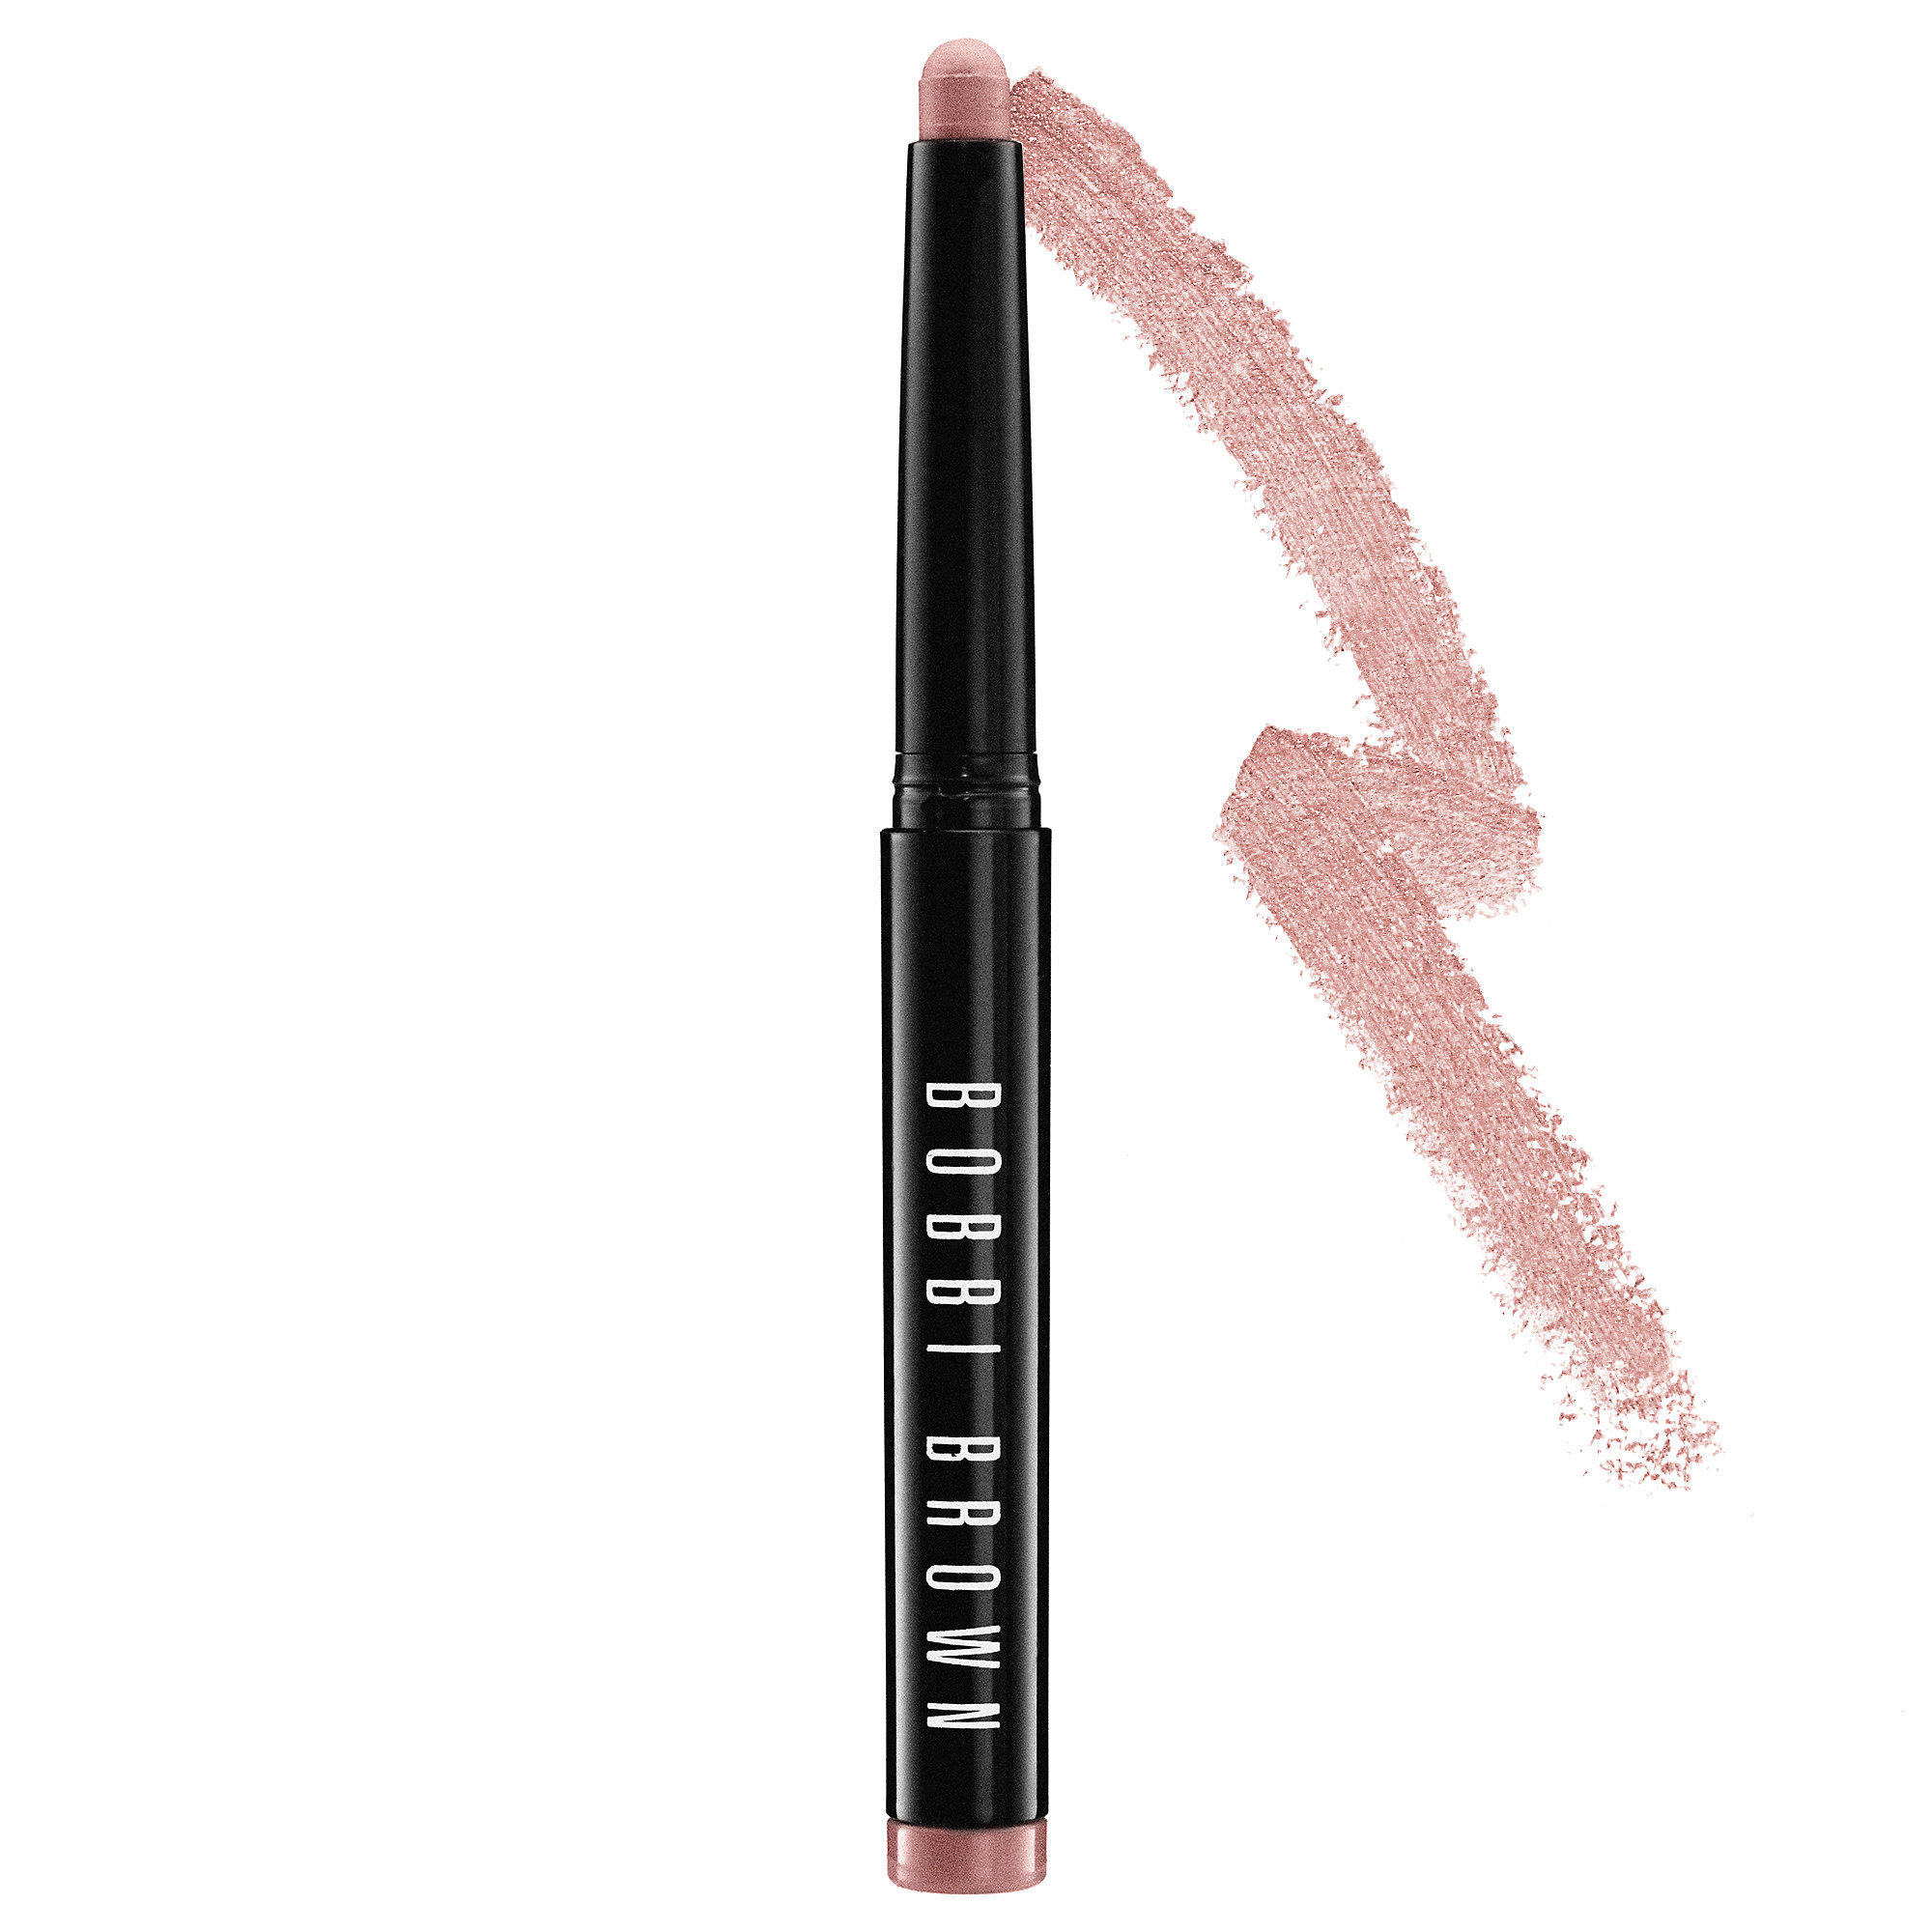 Bobbi Brown Long-Wear Cream Shadow Stick Pink Sparkle